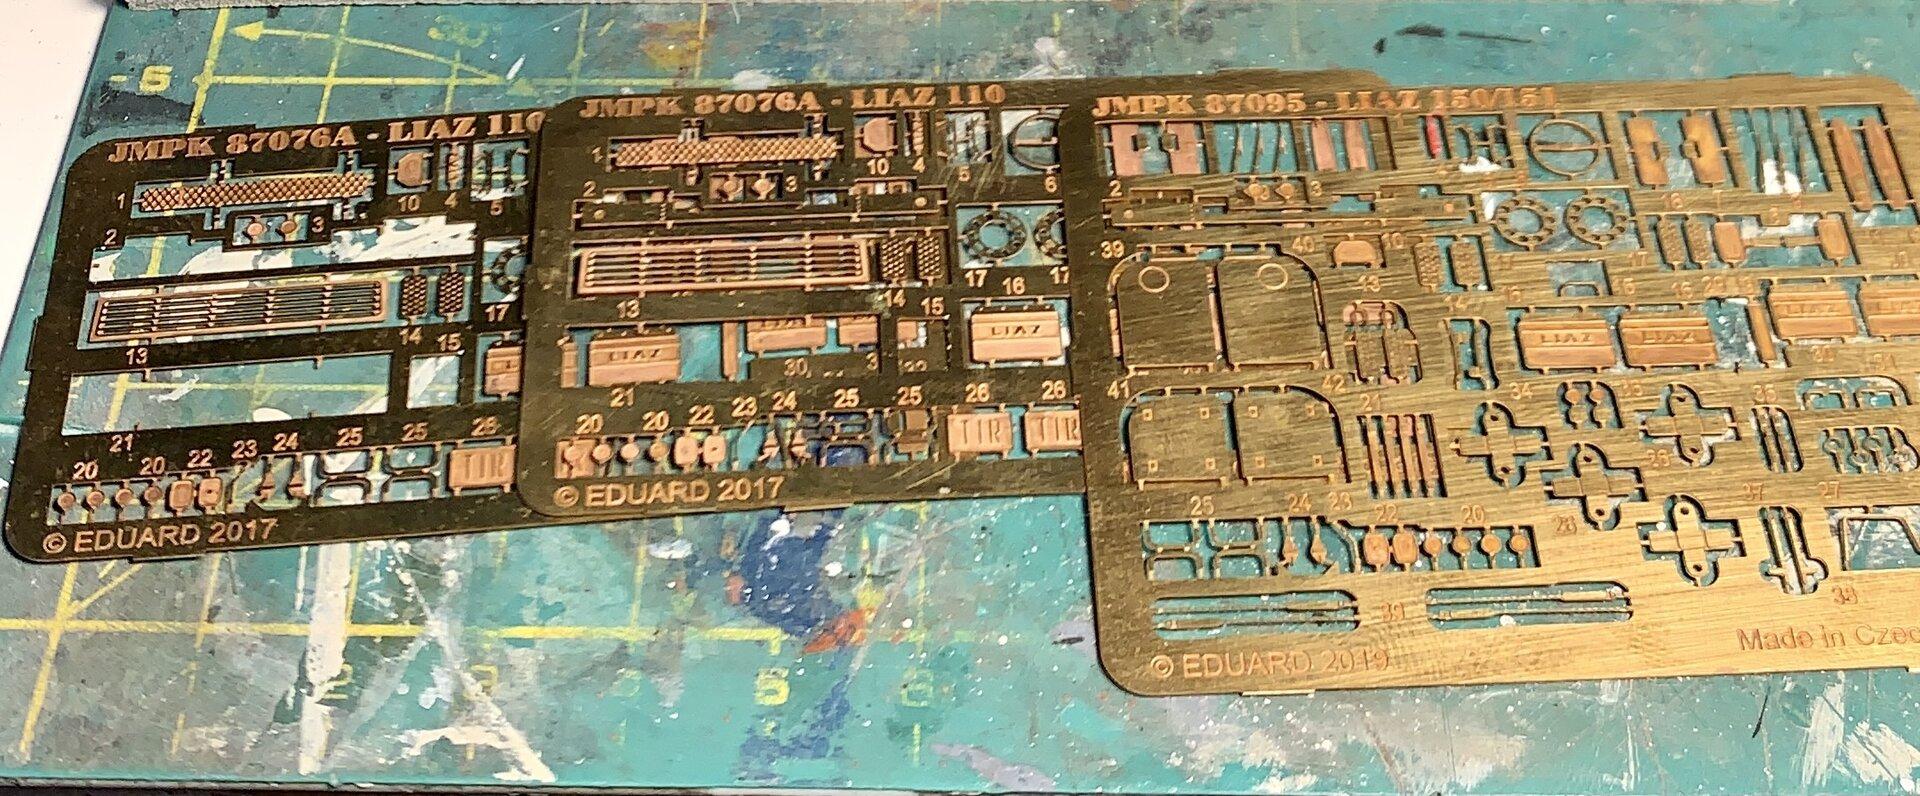 F967BD1B-0E37-40B8-B0E7-014F11DBDDE6.jpeg